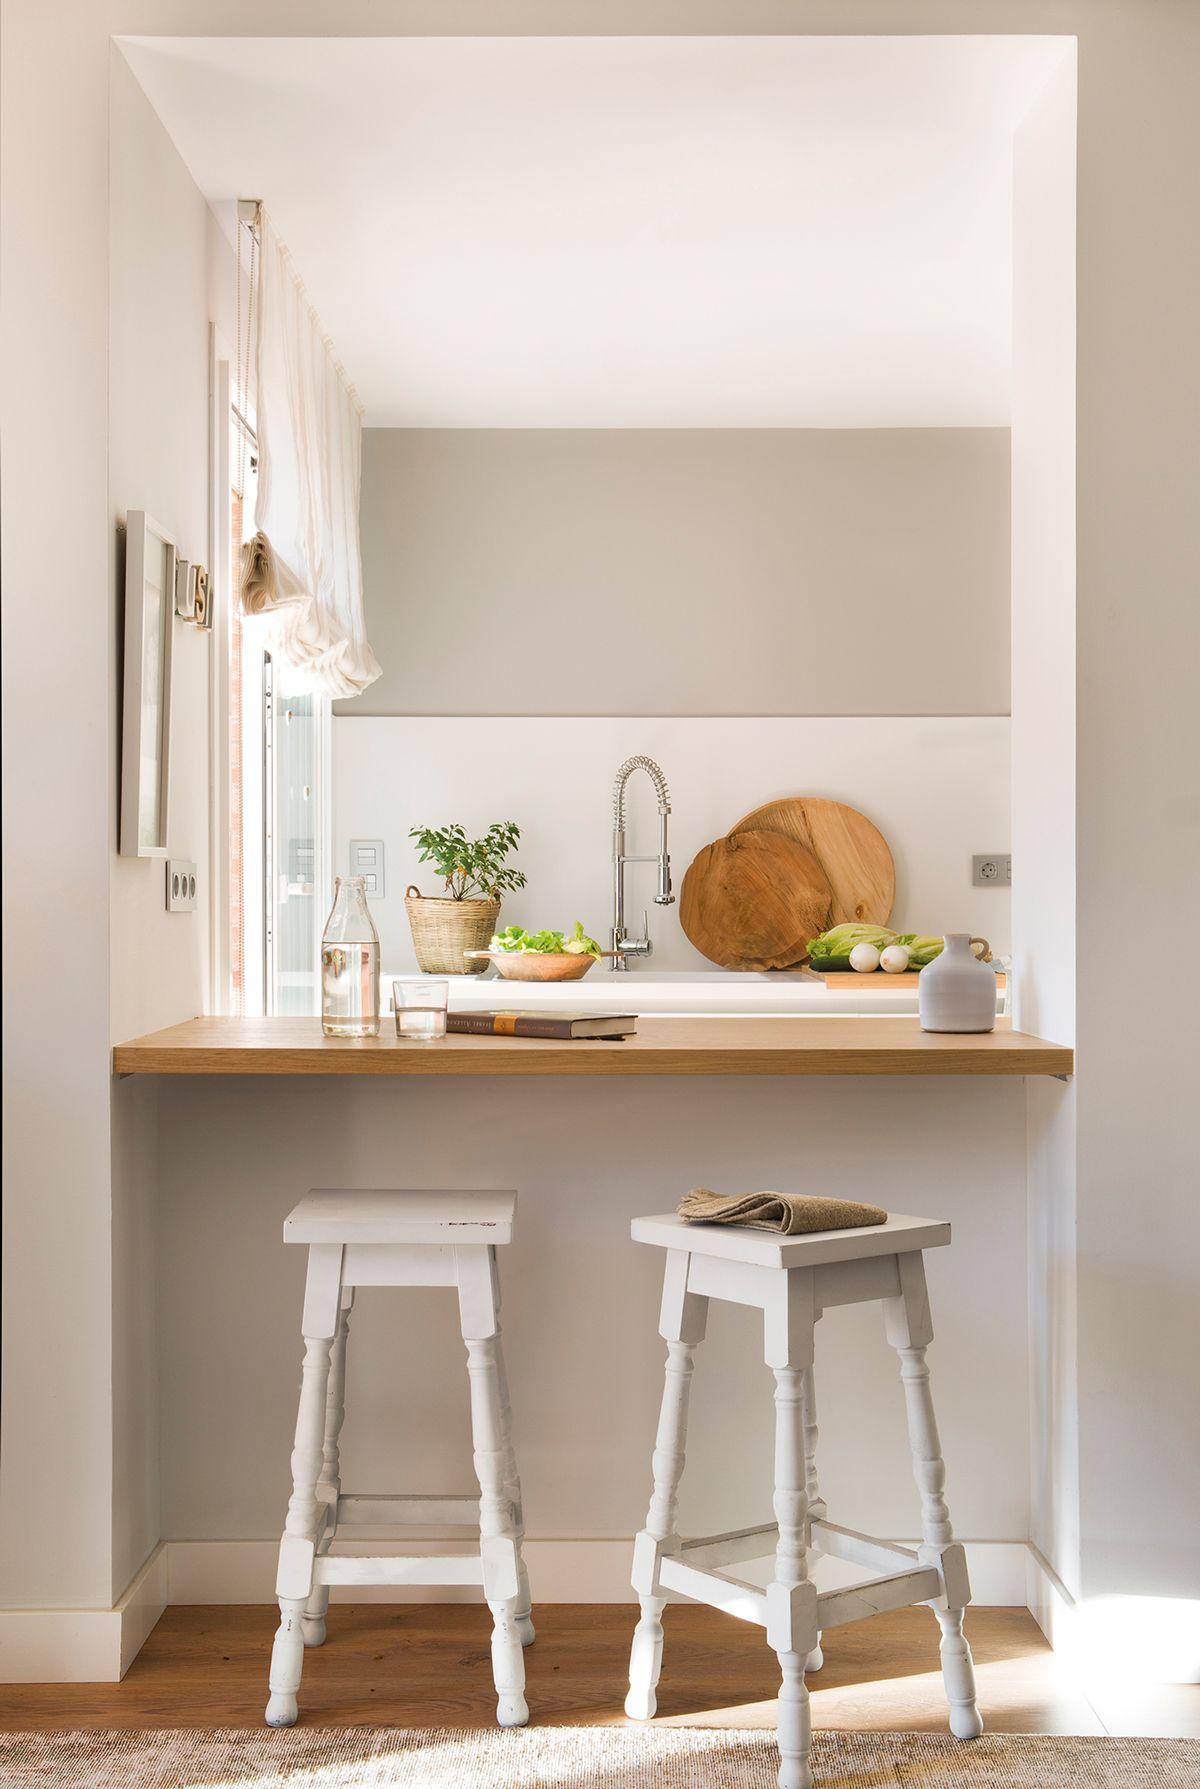 Cocina blanca con hueco pasaplatos barra de desayuno con - Taburete barra cocina ...